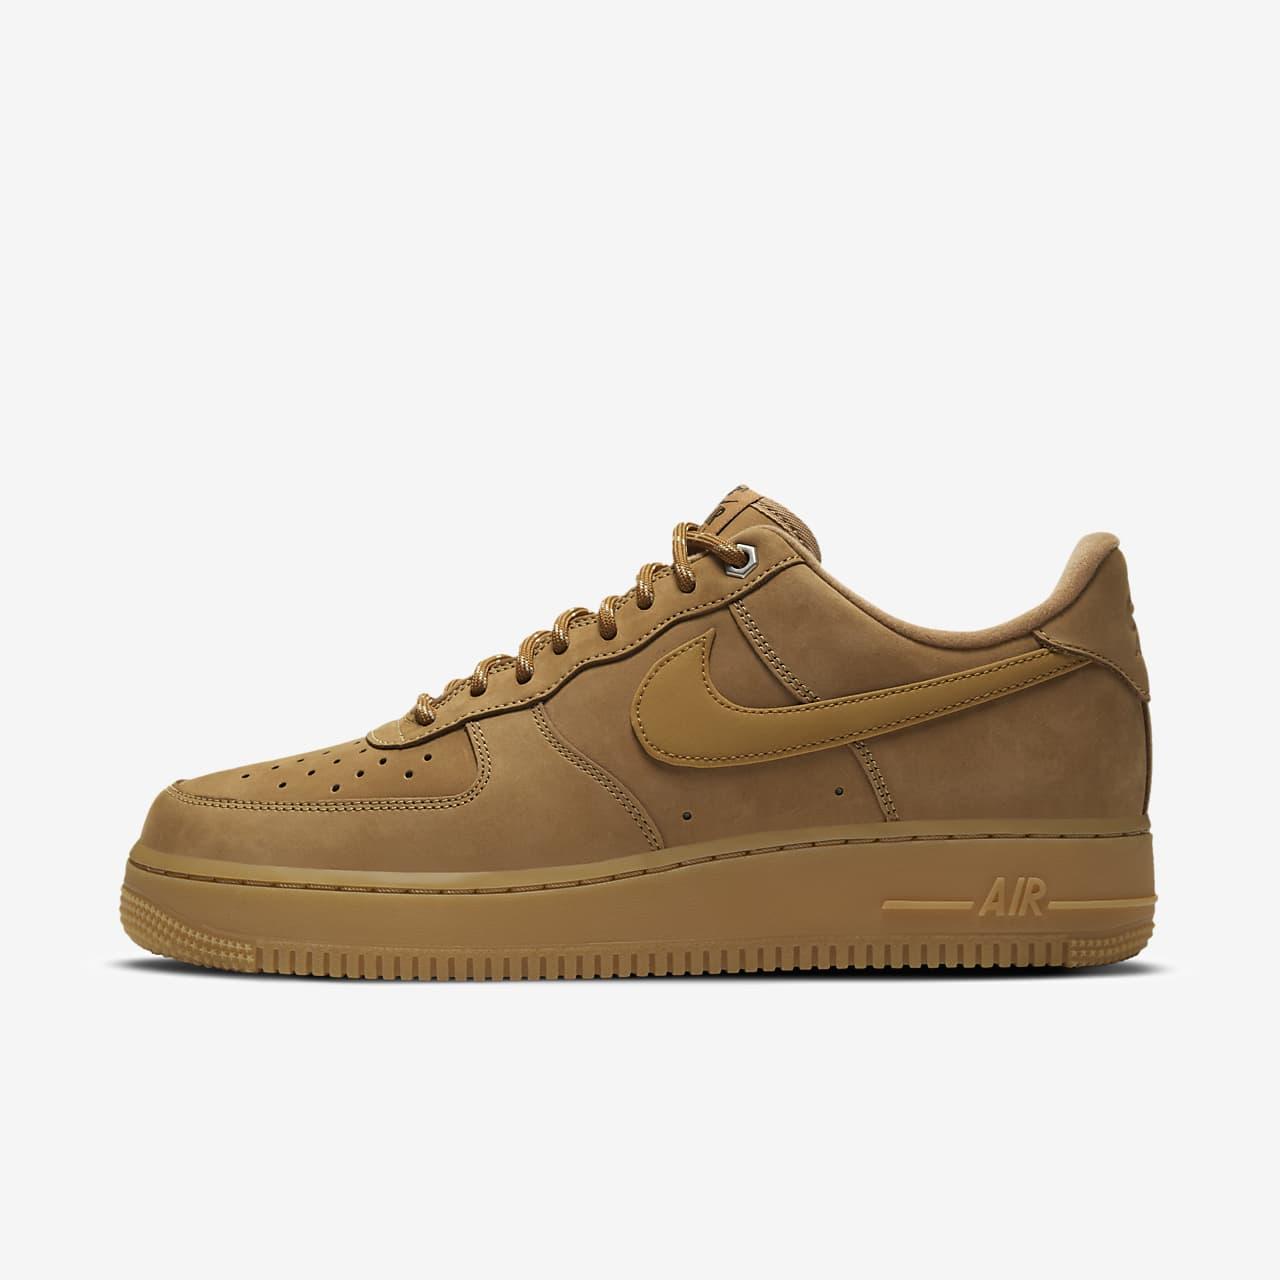 Nike Air Force 1 '07 WB Herenschoen